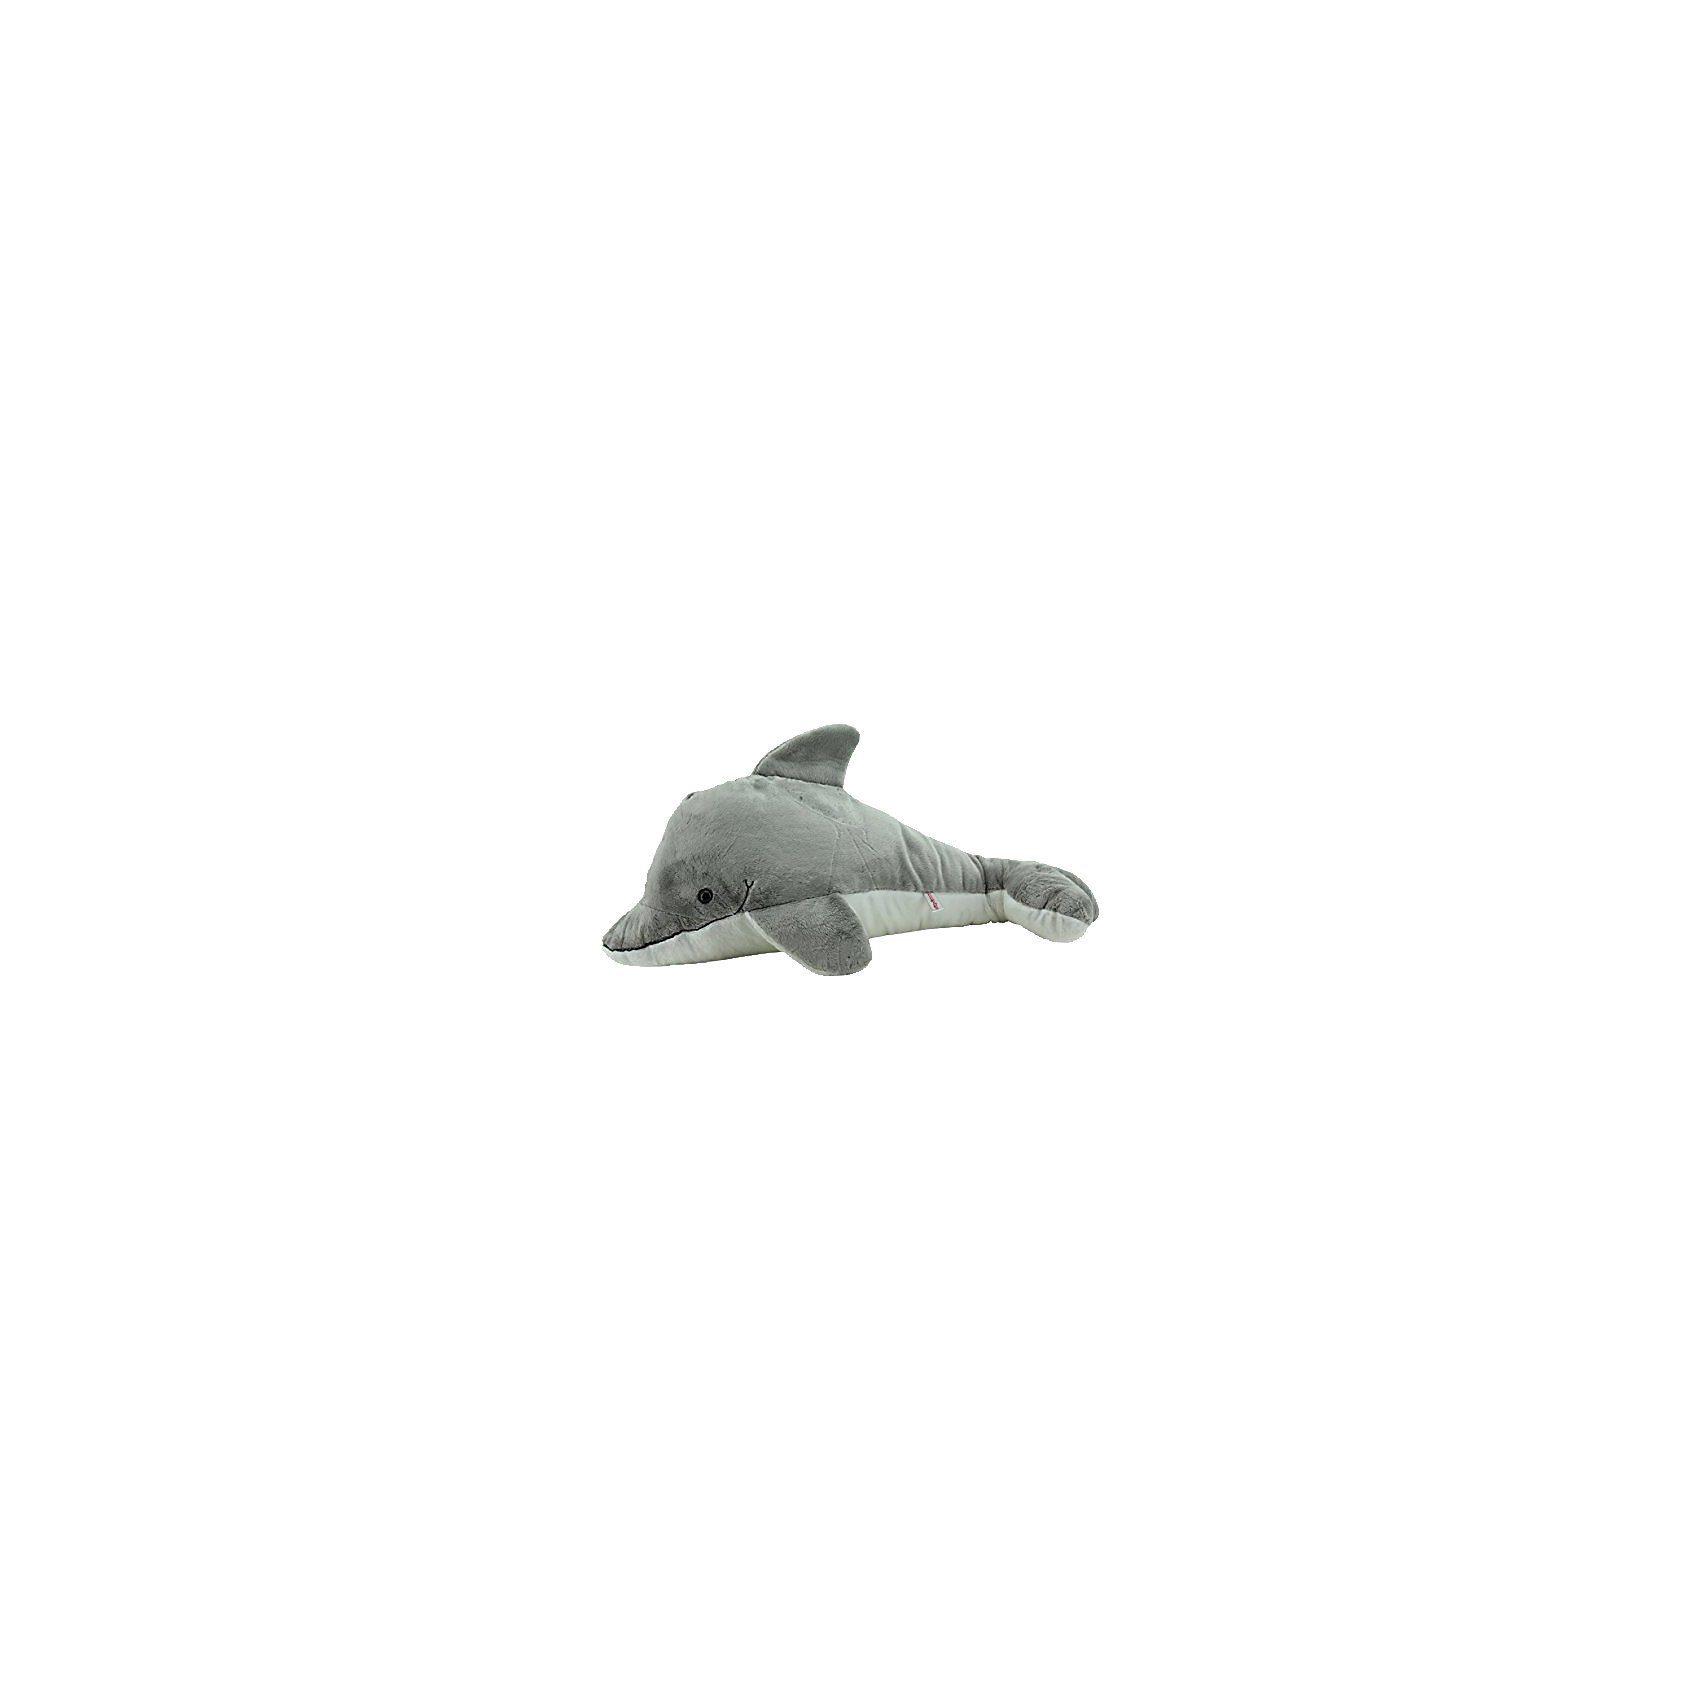 Sweety-Toys Sweety Toys 7820 XXL Riesen Delfin grau, 75 cm